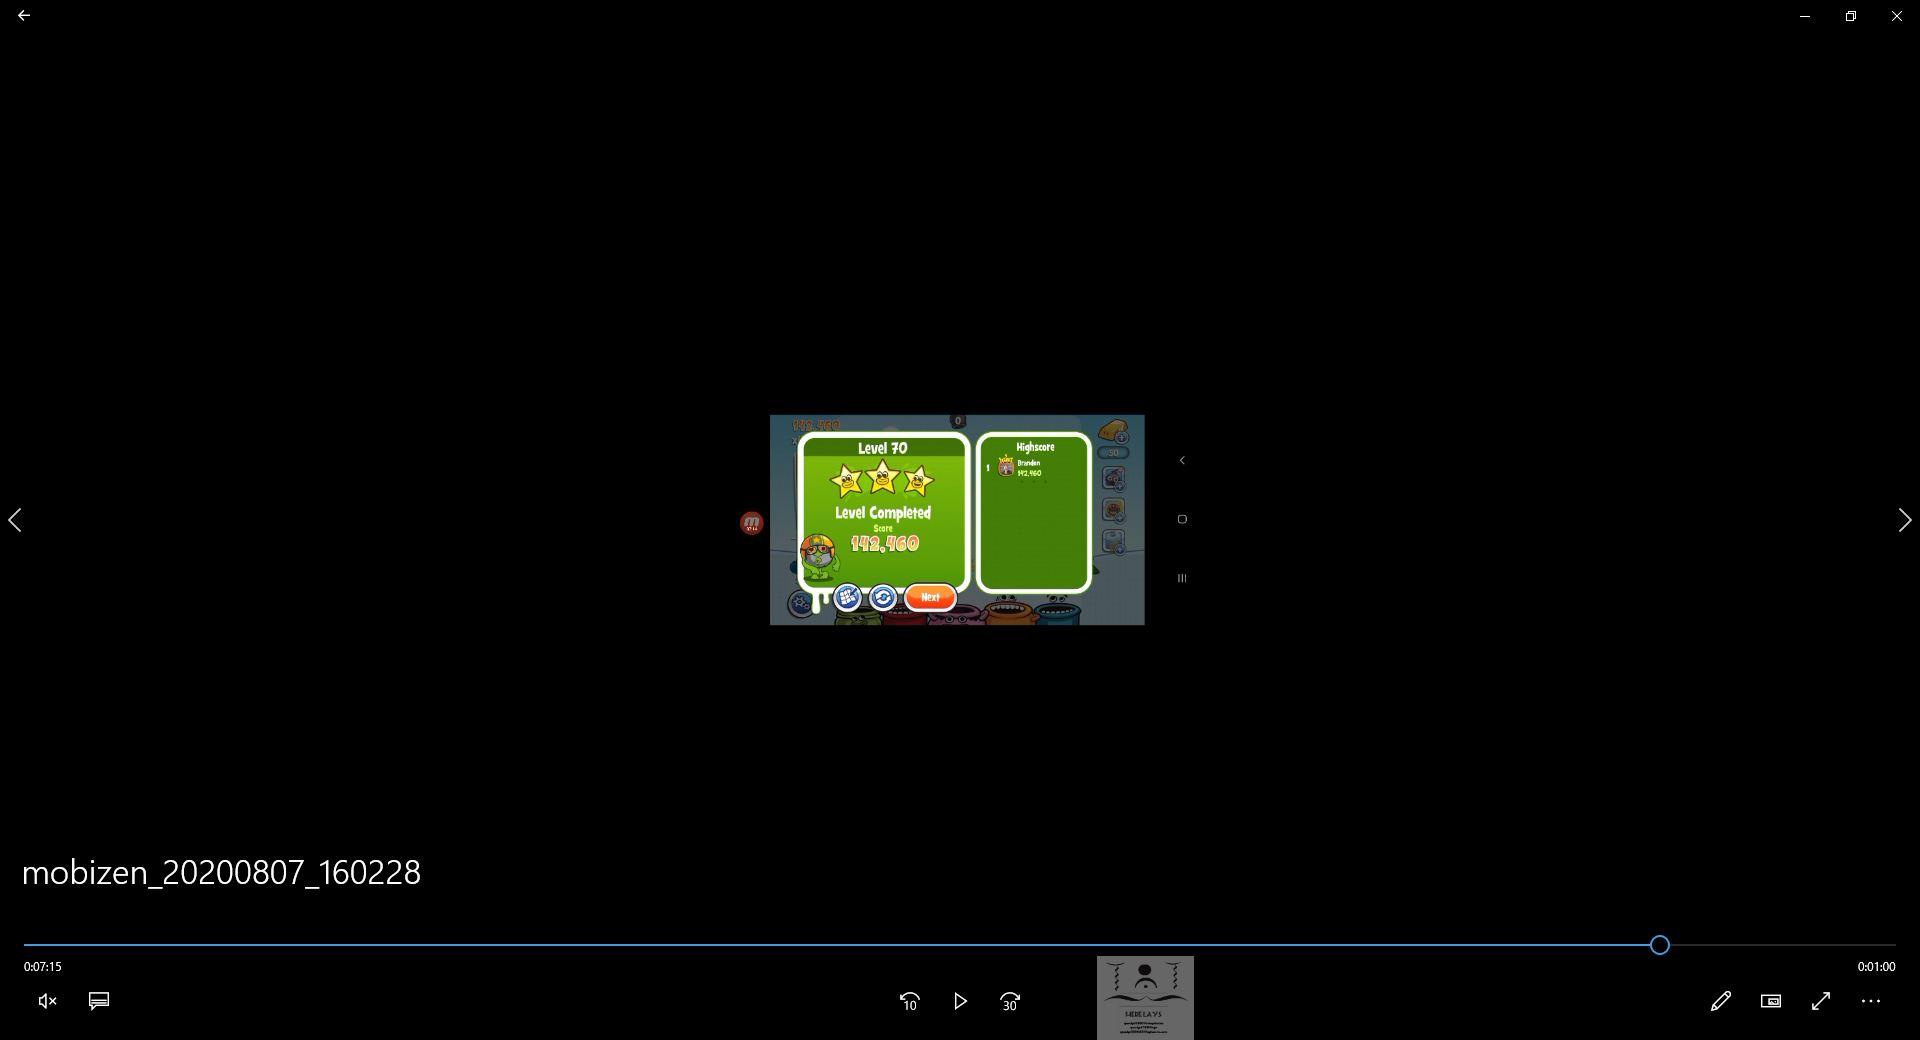 speedy4759123: Papa Pear Saga: Level 070 (Android) 142,460 points on 2020-08-10 21:57:46